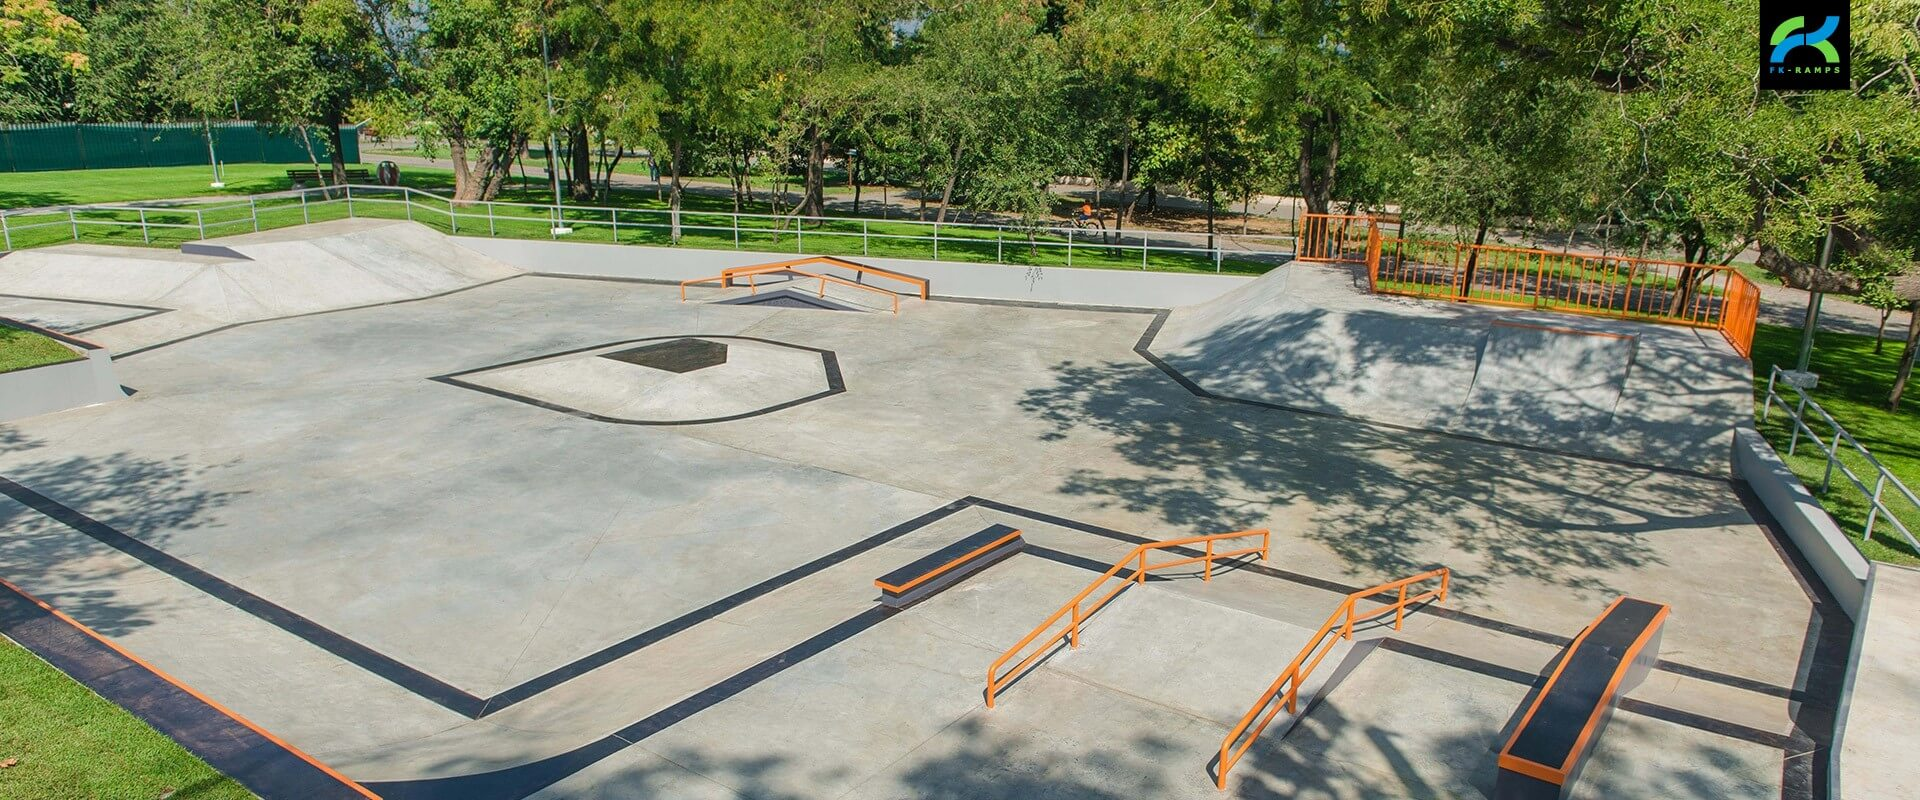 Бетонный скейт-парк FK-ramps в одессе